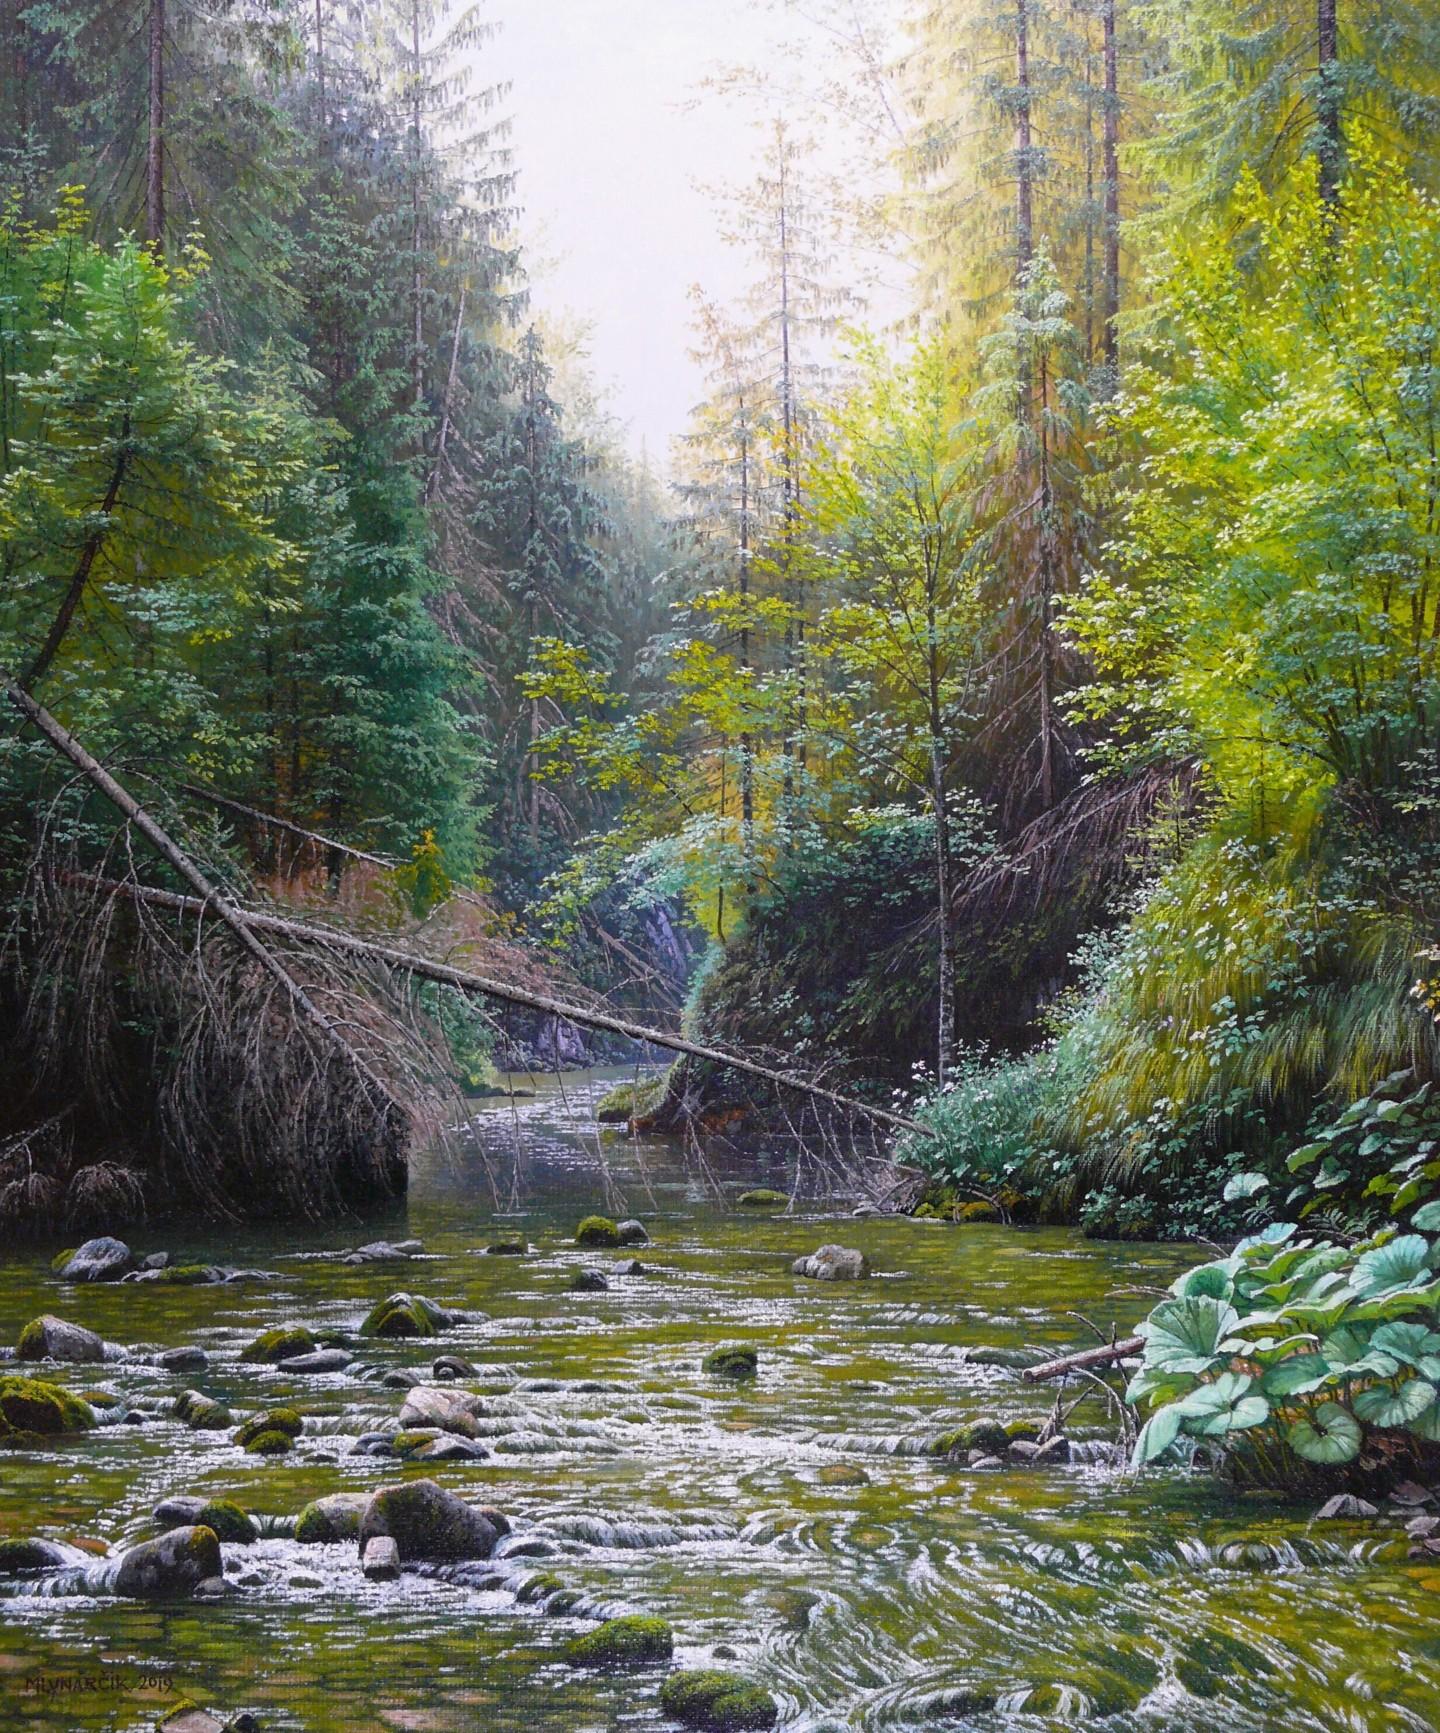 Emil Mlynarcik - Deep in the mysterious forest